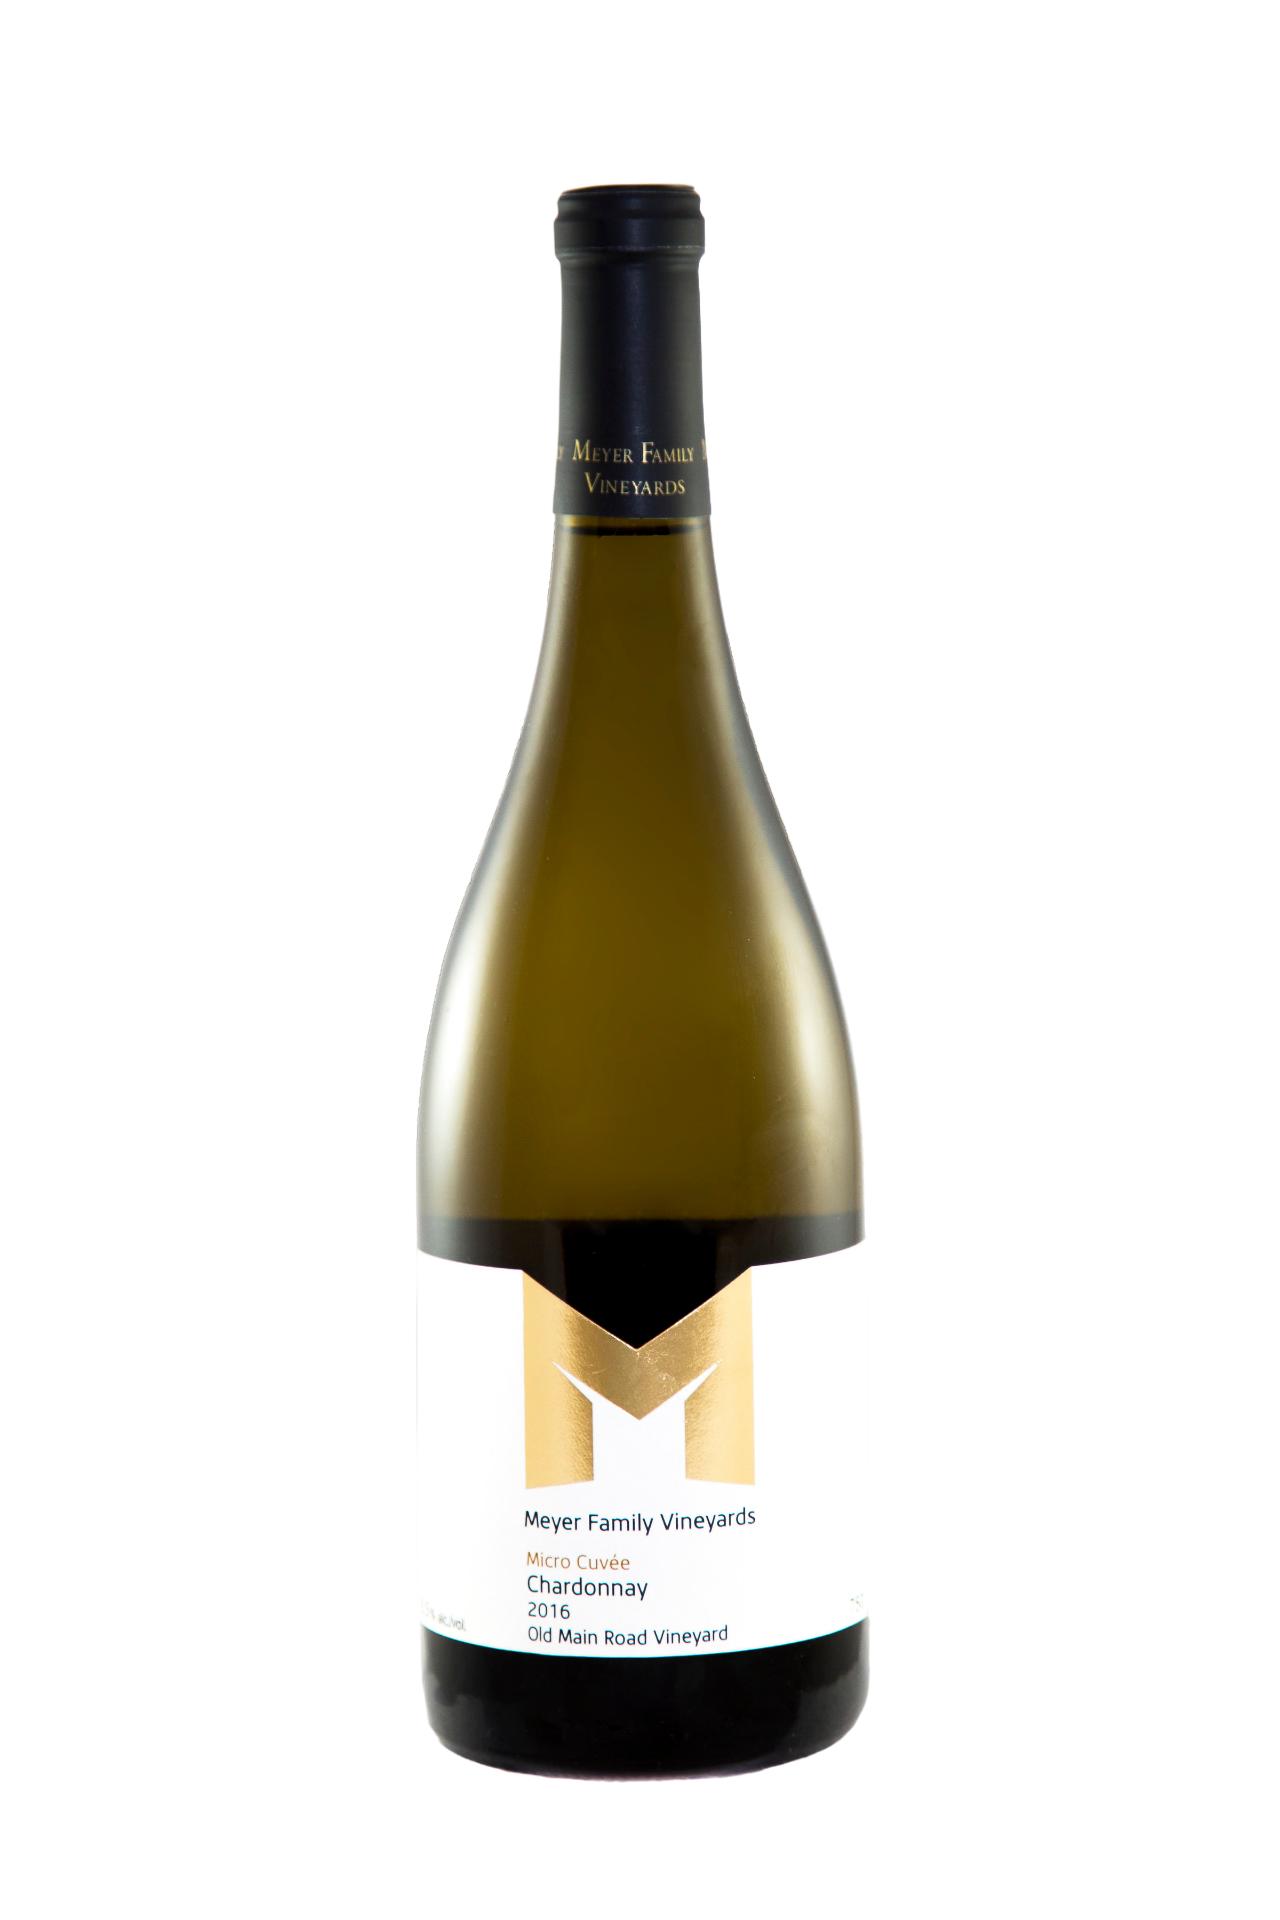 Micro Cuvée Chardonnay